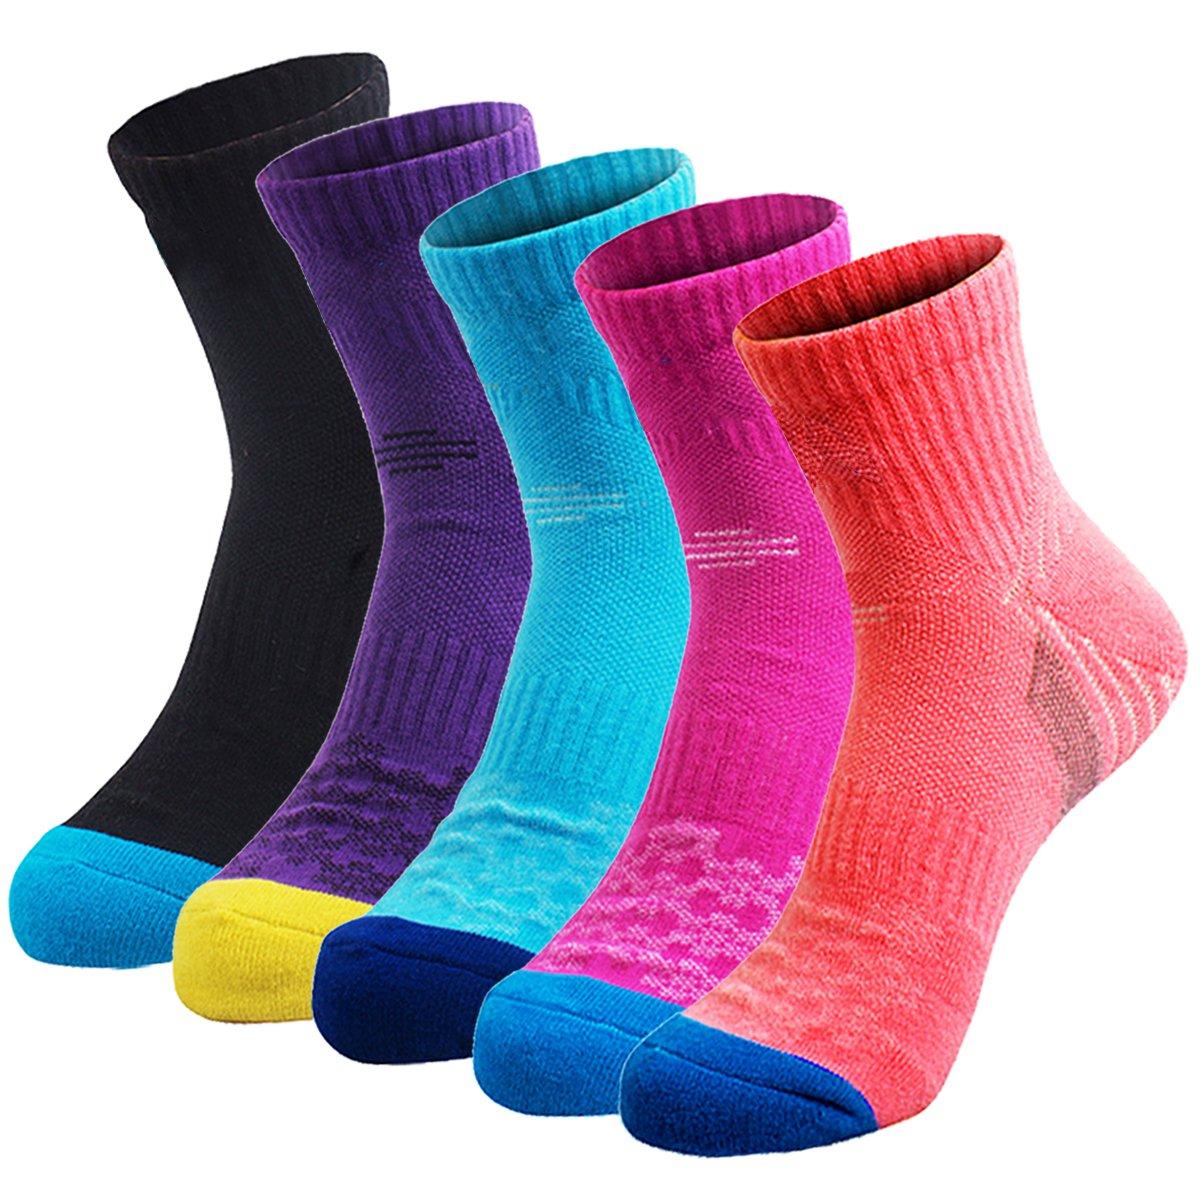 Veatree 5 Pairs Women's Multi Performance Cushion Summer Hiking Socks, Size 6-9